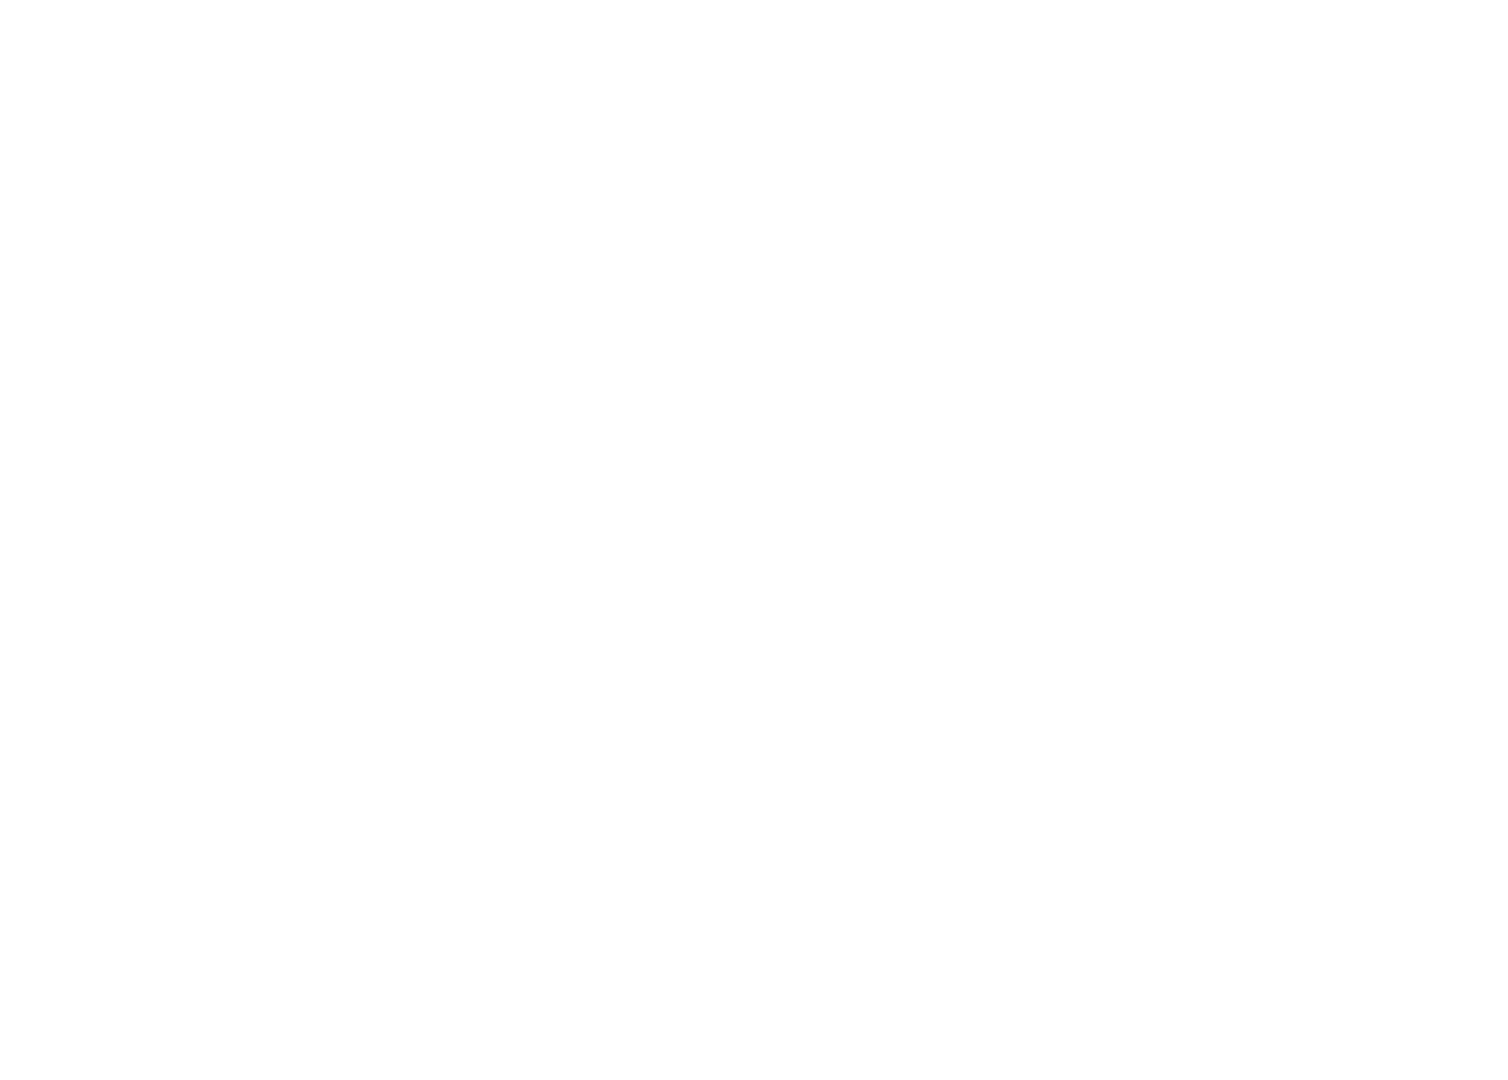 Roti Mahal - roti restaurant